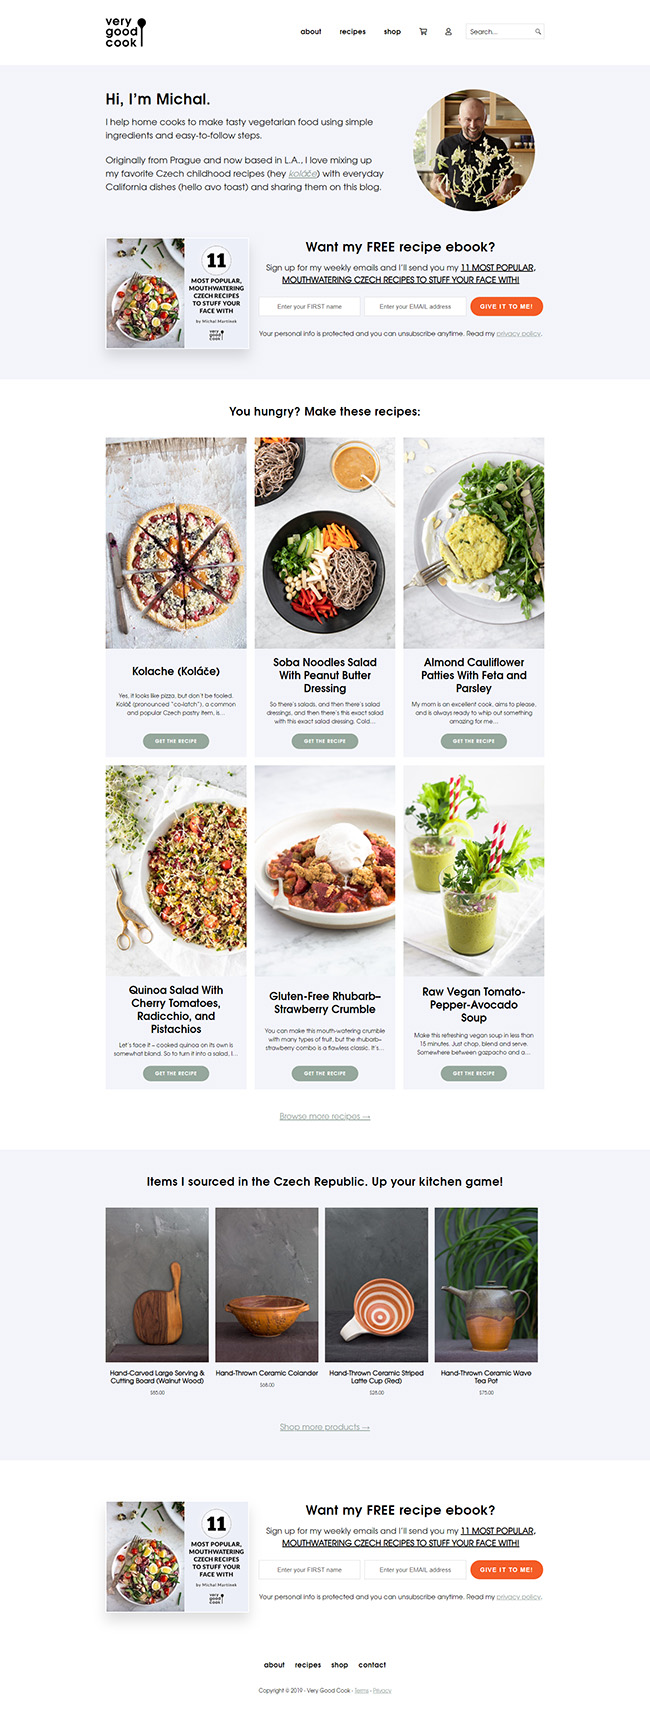 Screen shot of Very Good Cook website homepage